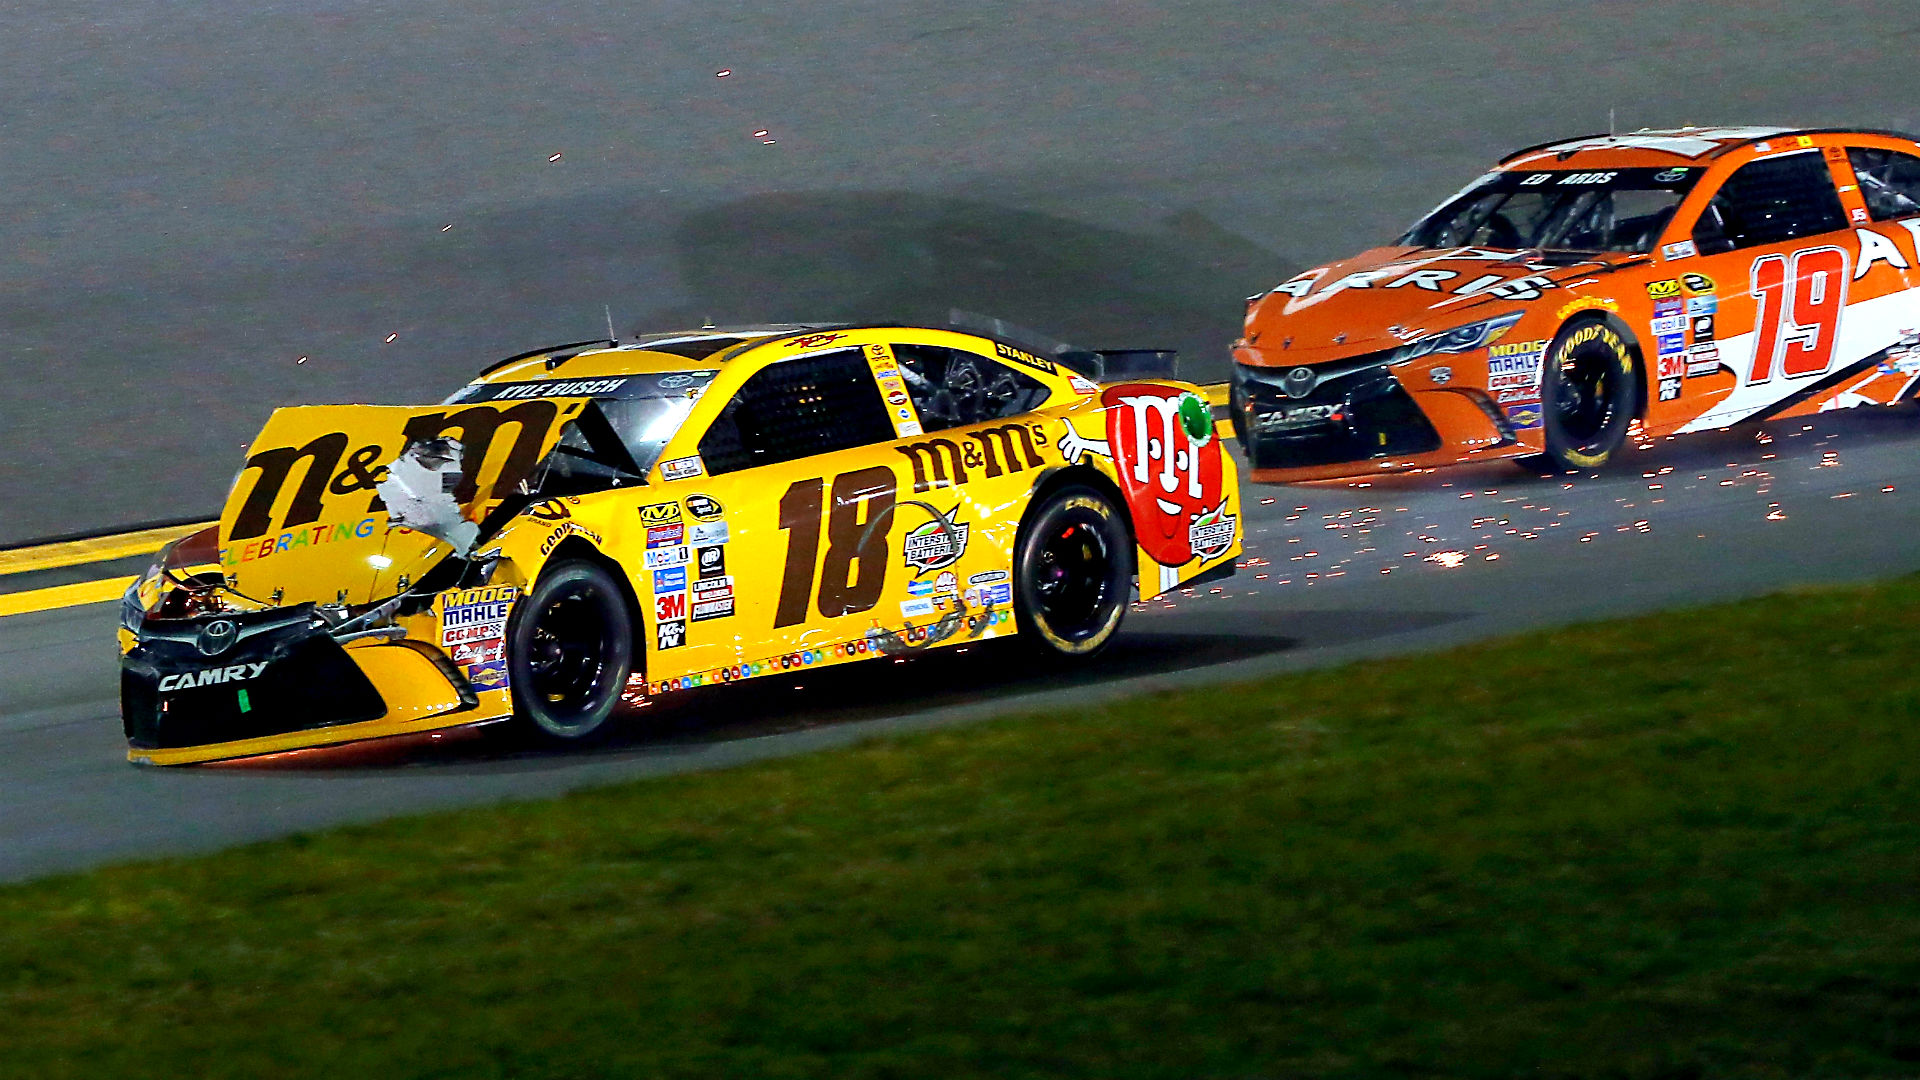 Carl Edwards takes blame for Daytona crash that mangled Kyle Busch\'s ...